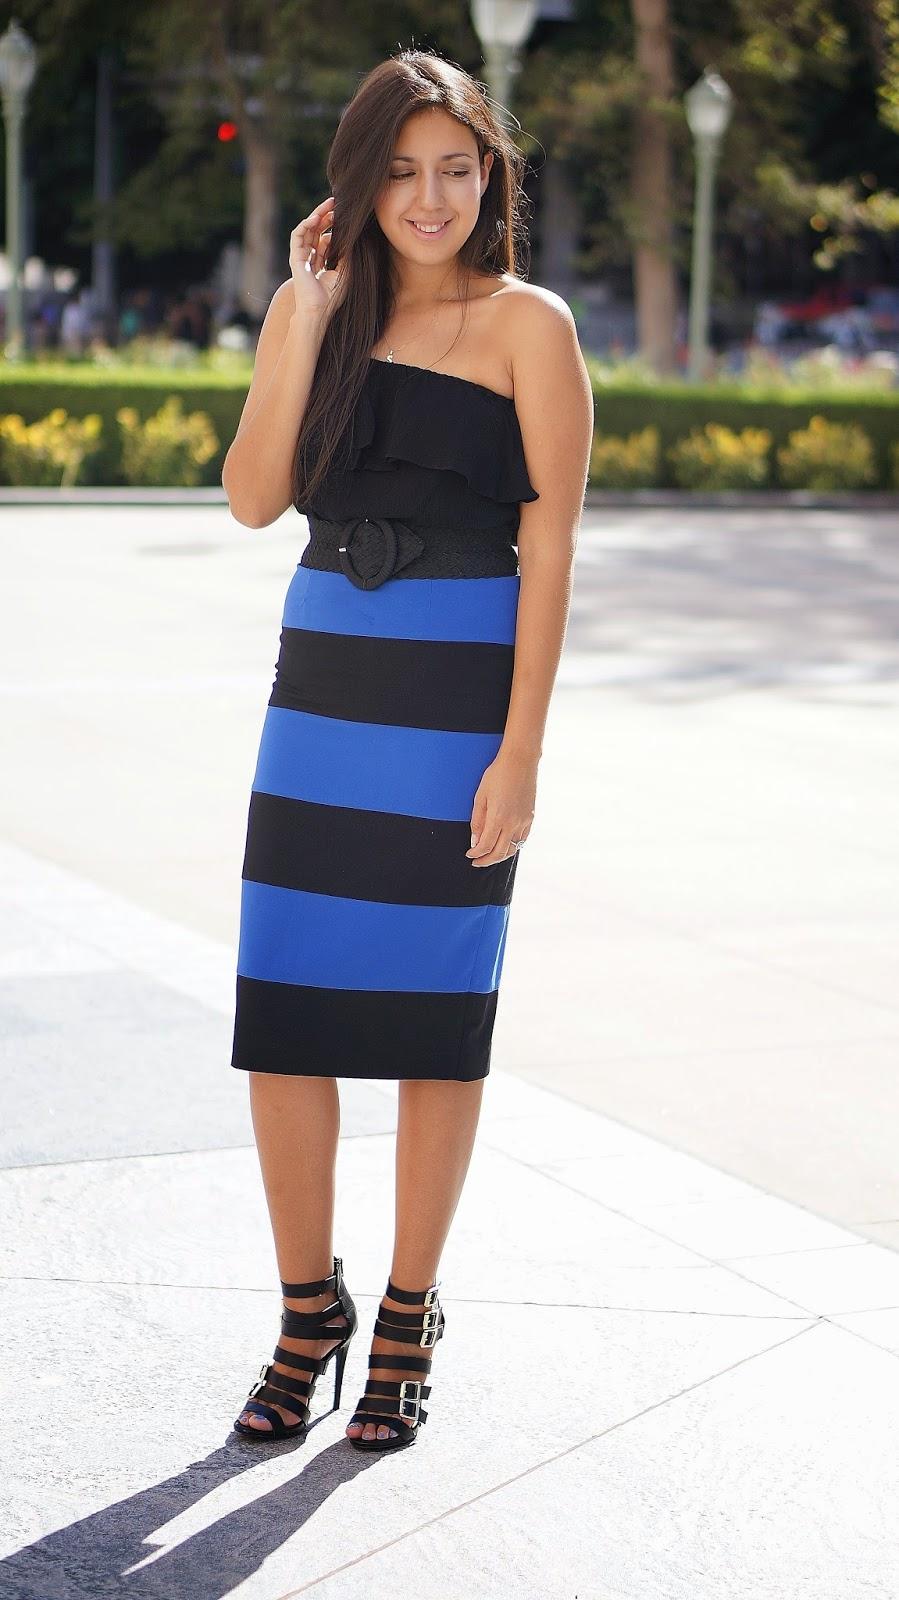 http://www.truehonestfashion.com/2014/07/striped-skirt.html